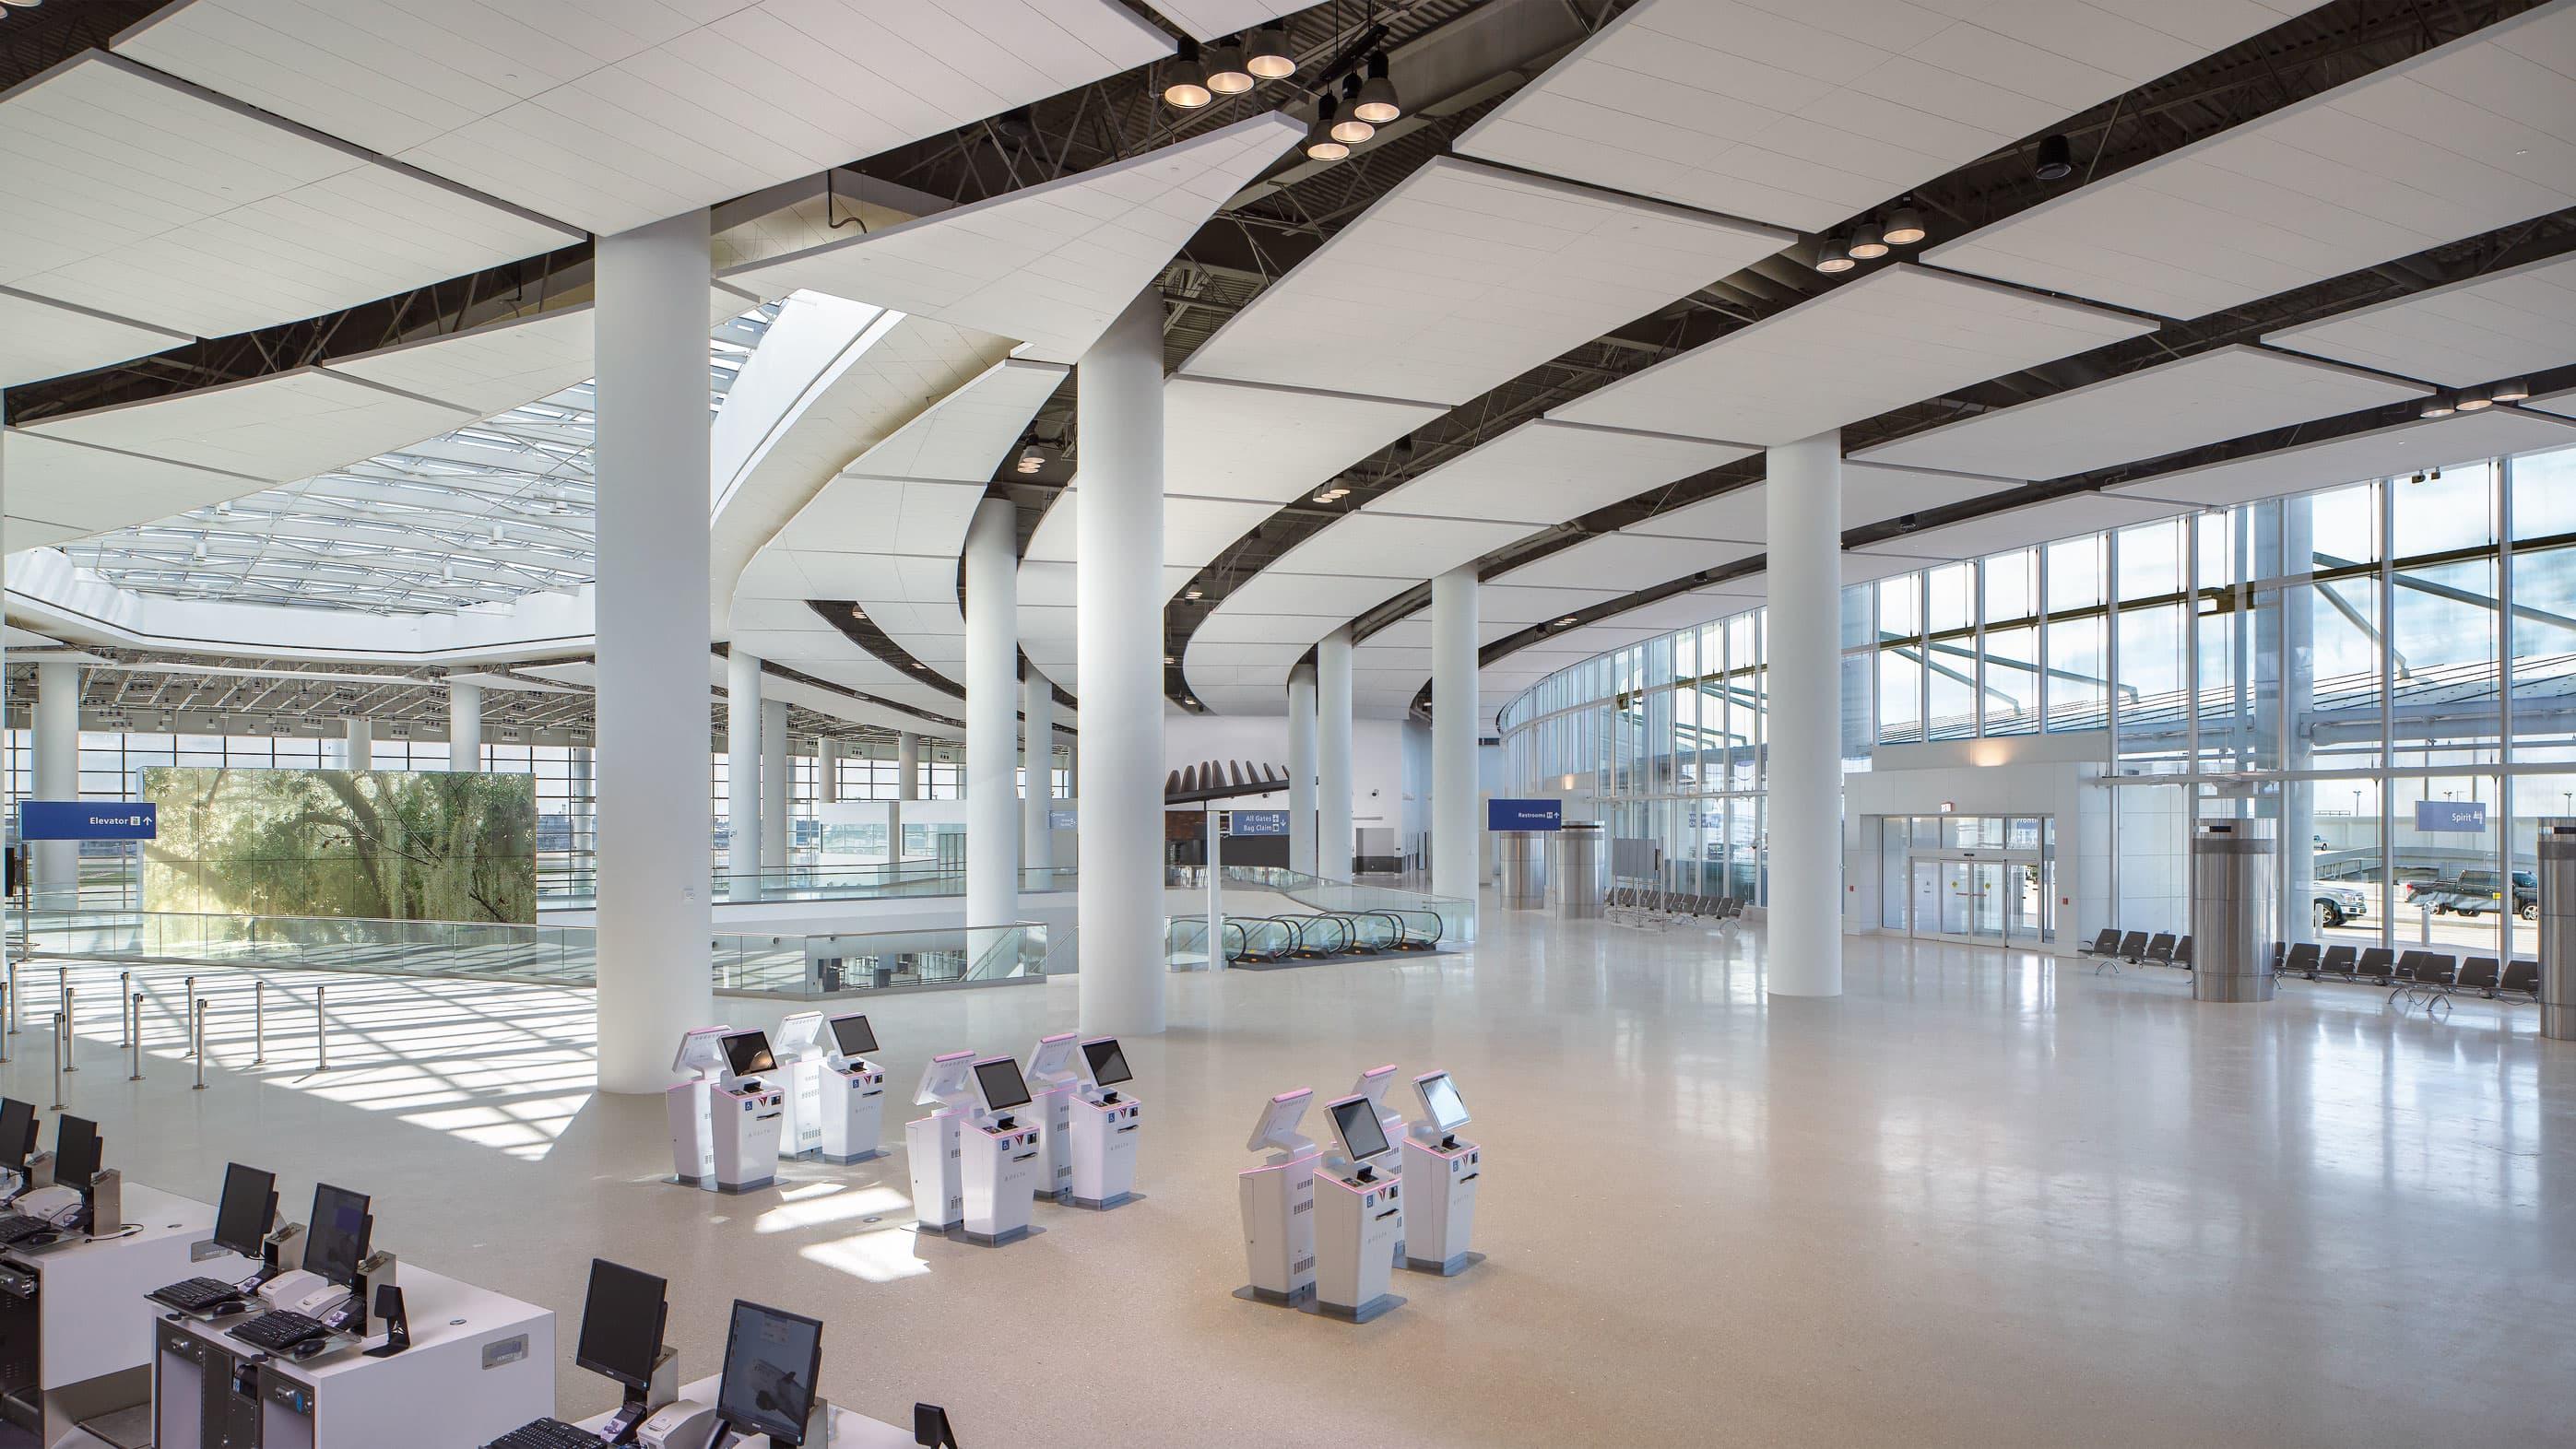 New Orleans airport debuts $1.3 billion terminal